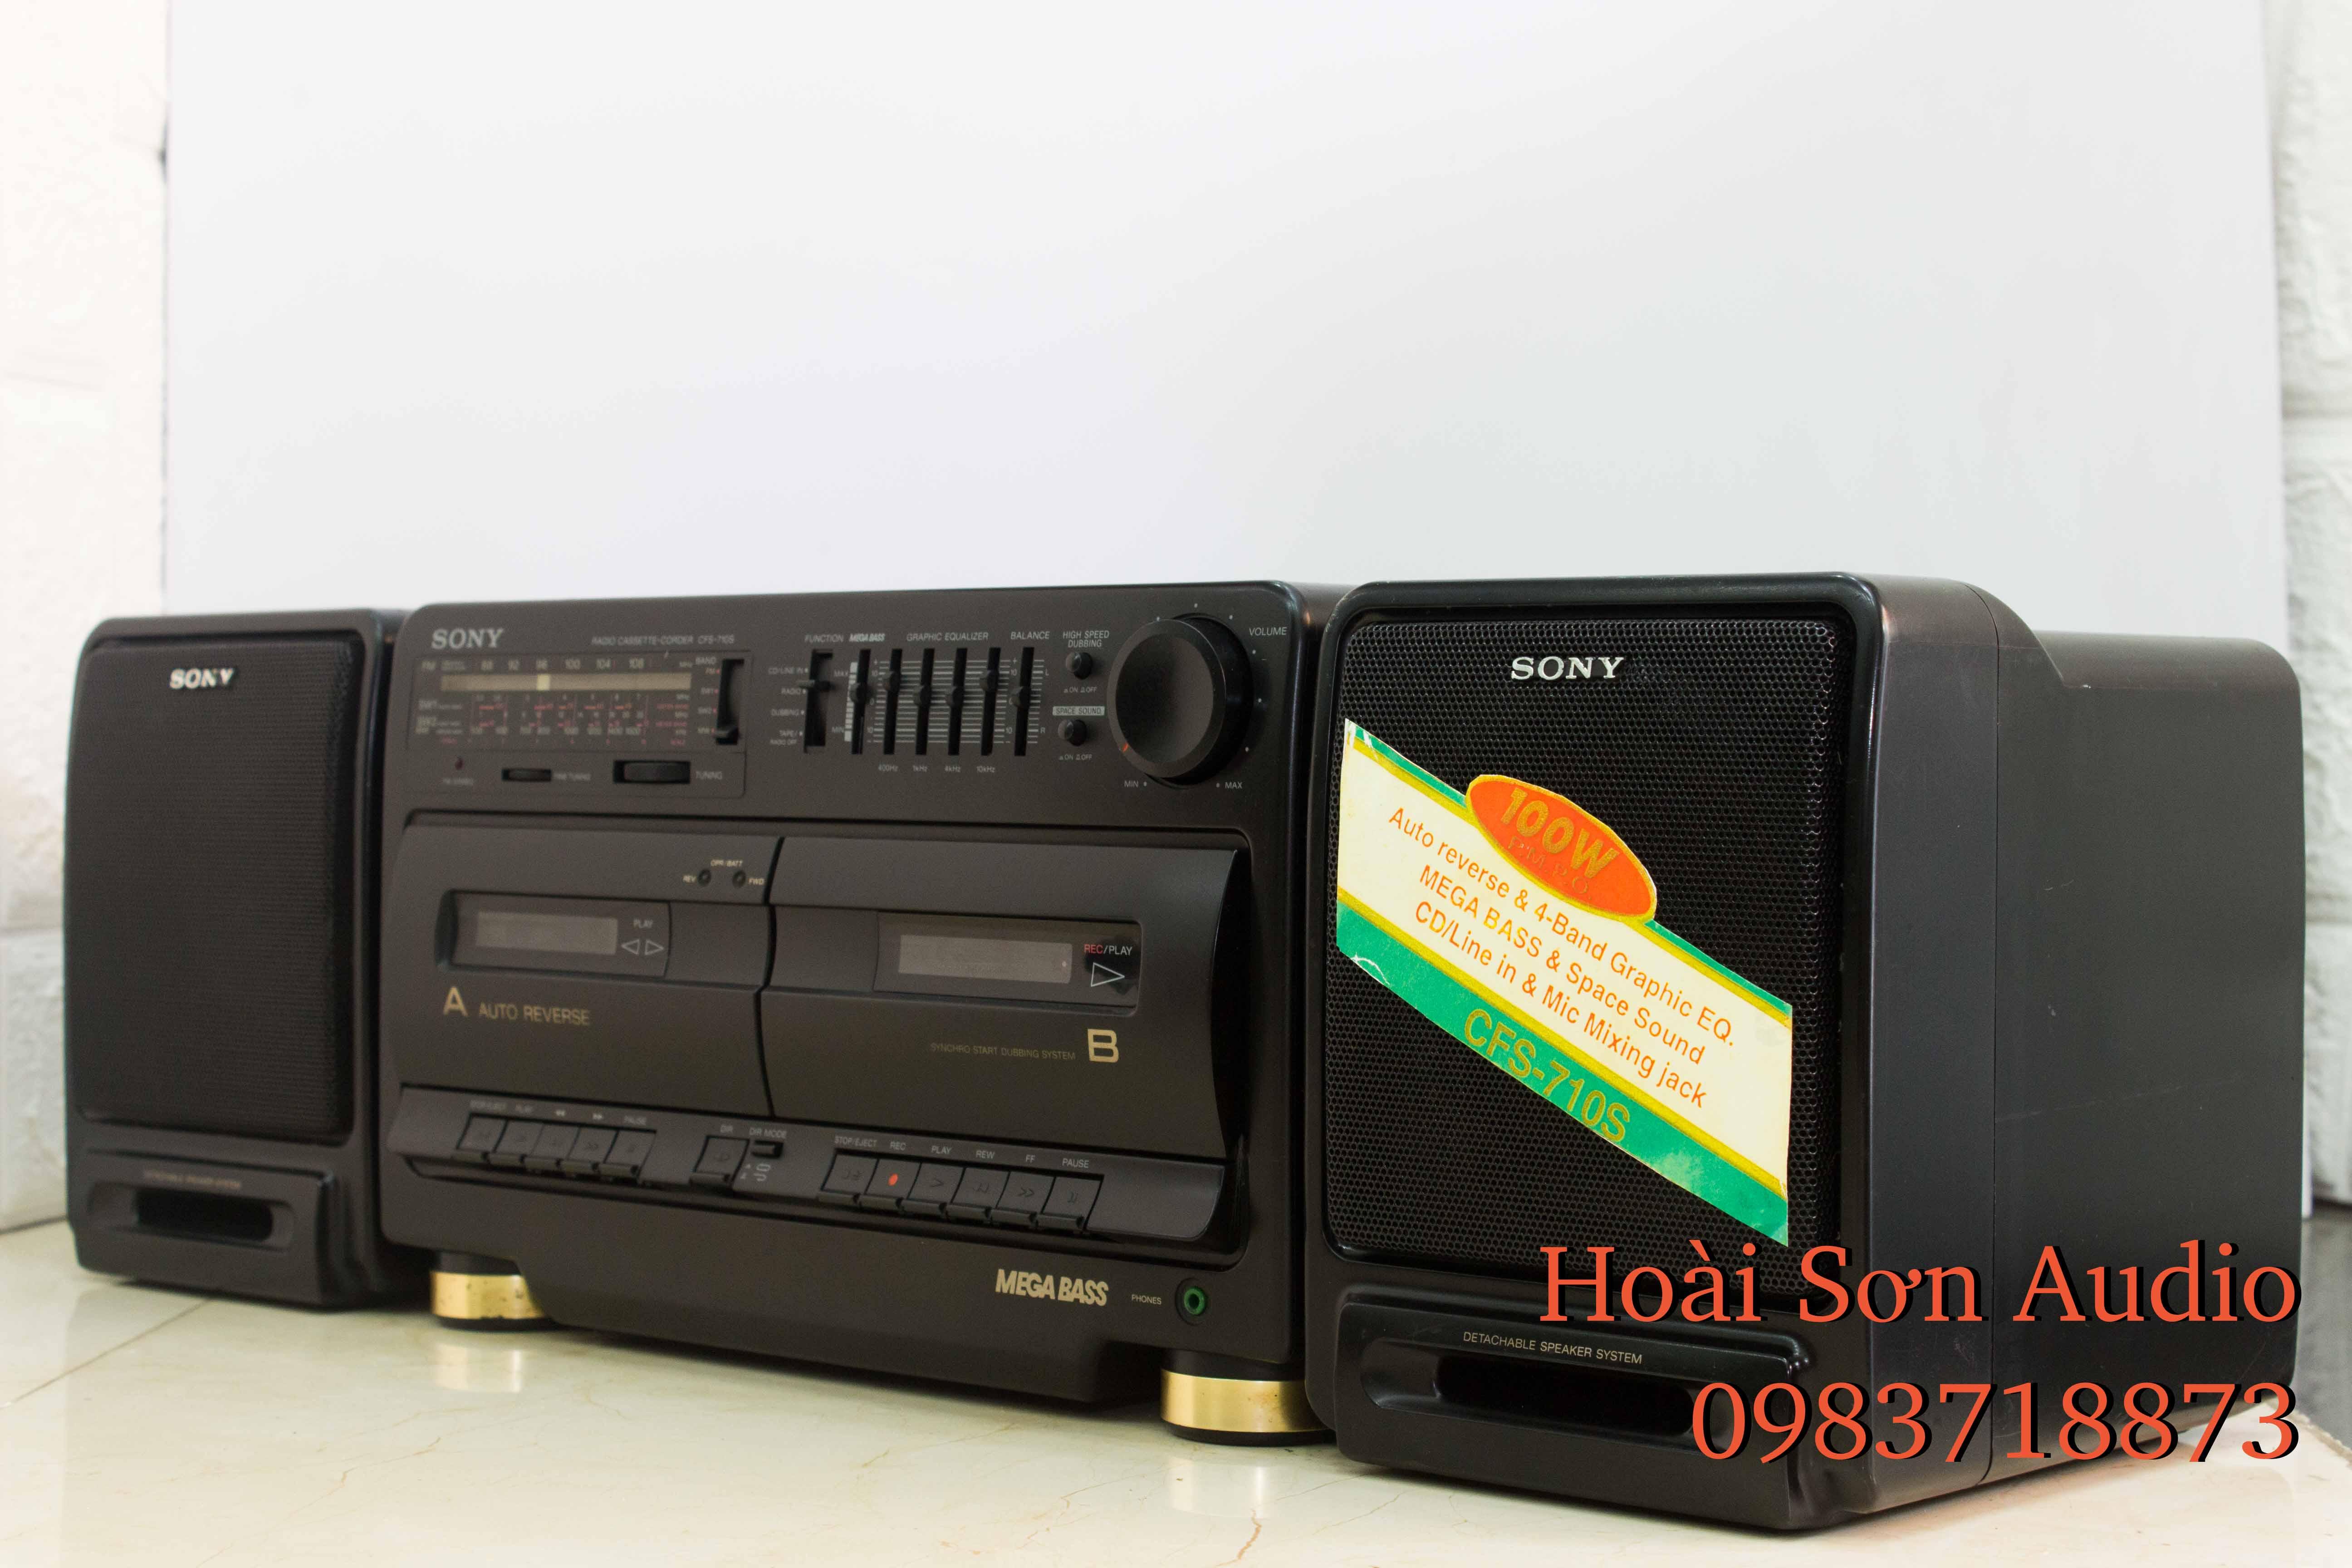 ĐÀI CỔ SONY 710S